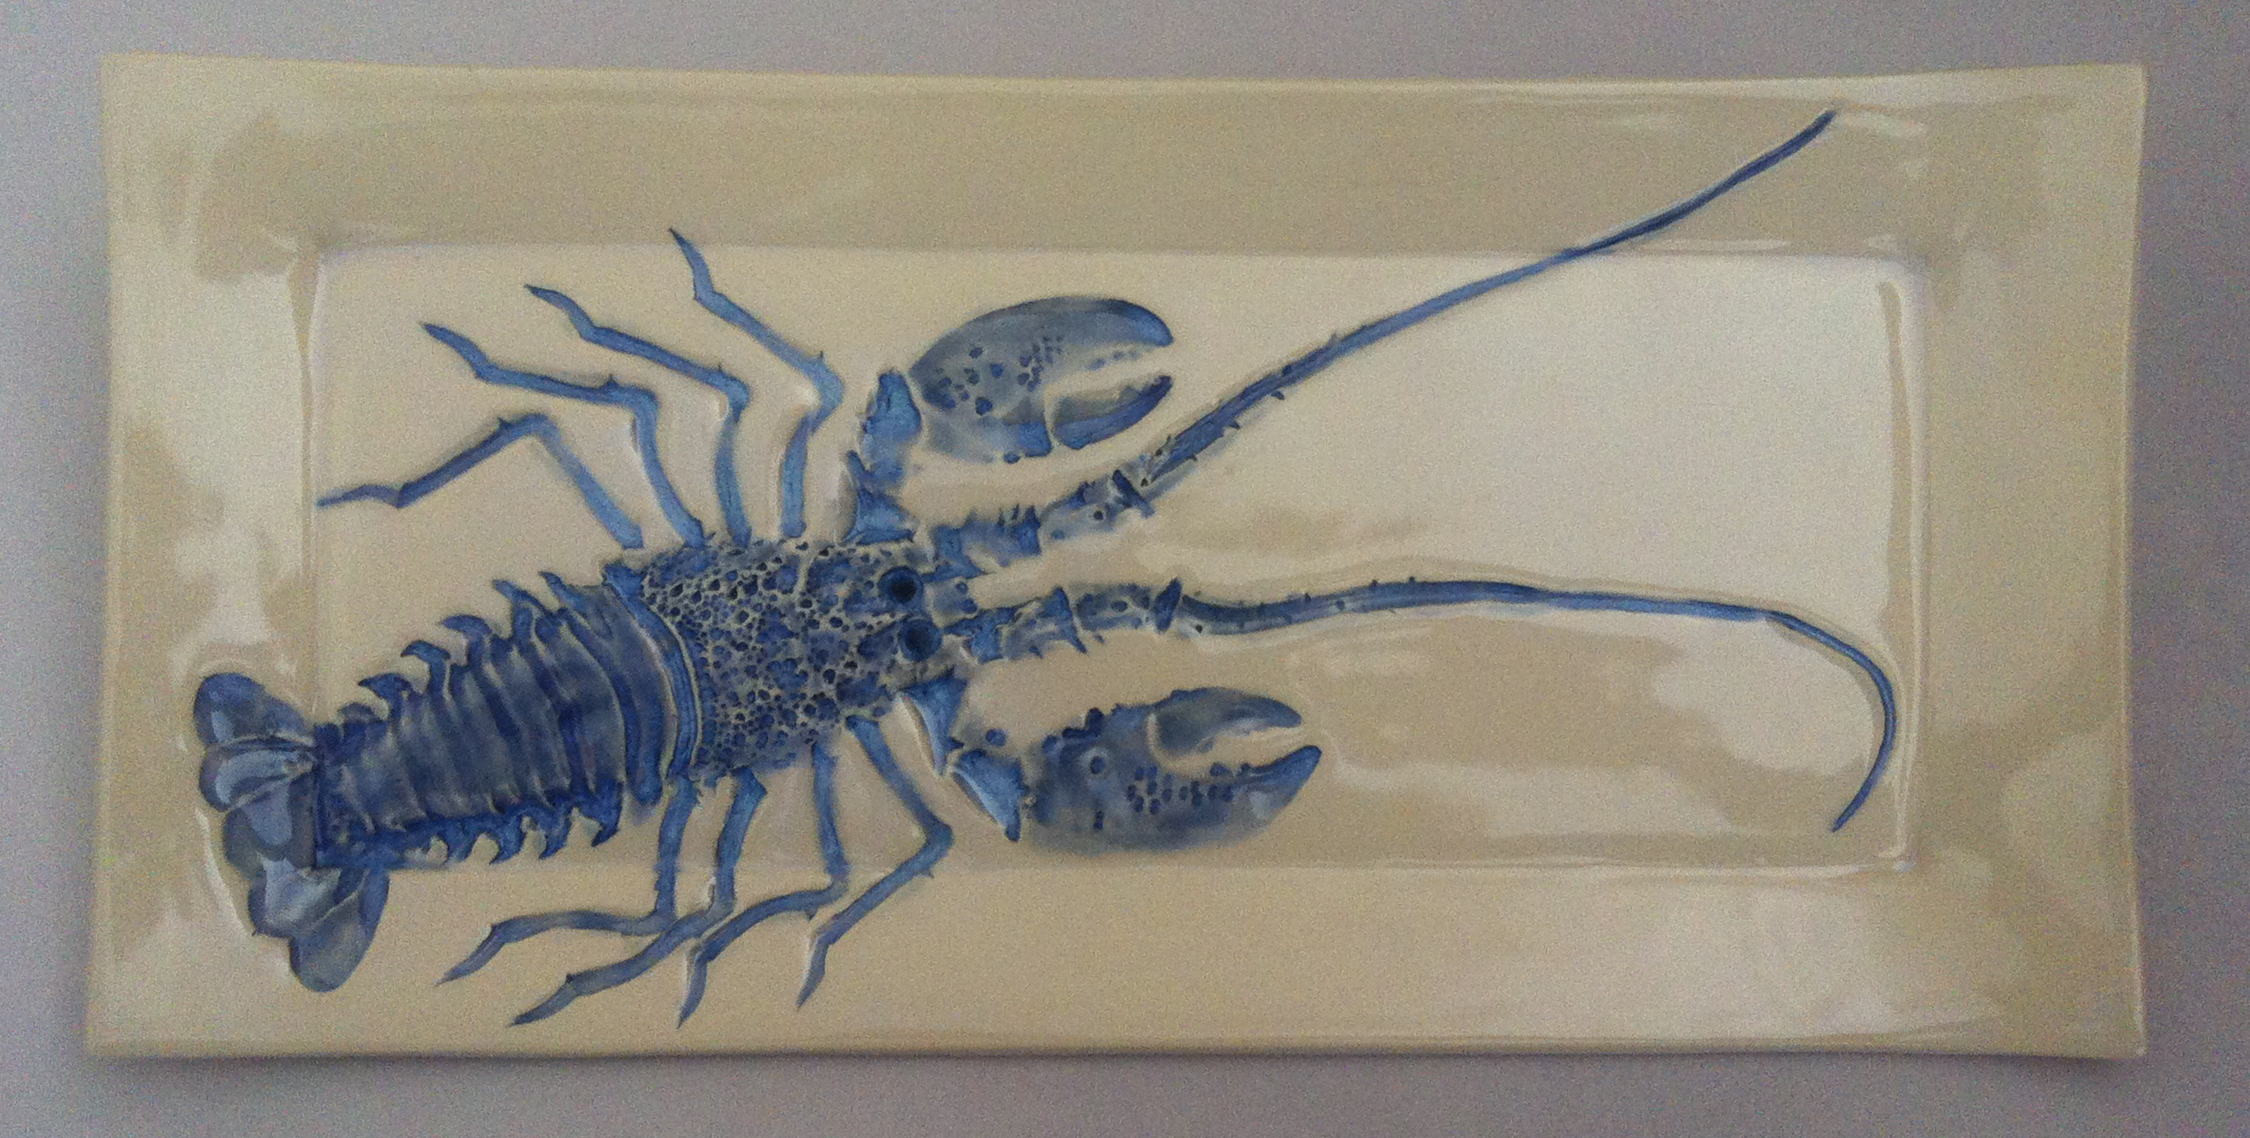 Blue Lobster Plate